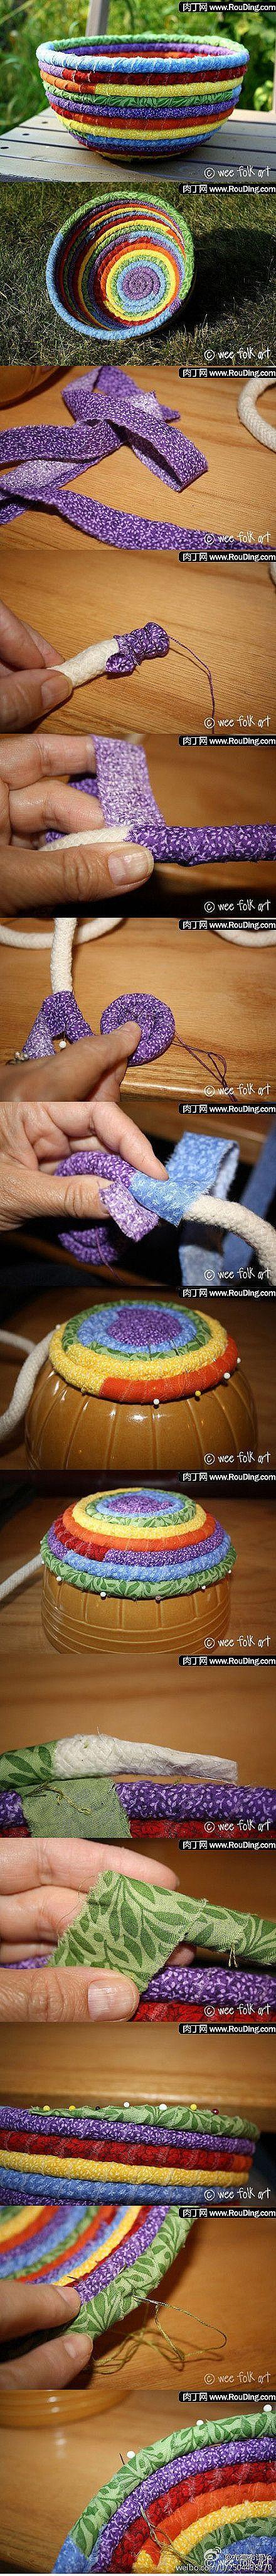 Scrap basketCrafts Ideas, Diy Crafts, Cute Ideas, Fabrics Scrap, Ropes, Fabrics Baskets, Scrap Fabrics, Coil Basket, Fabrics Bowls